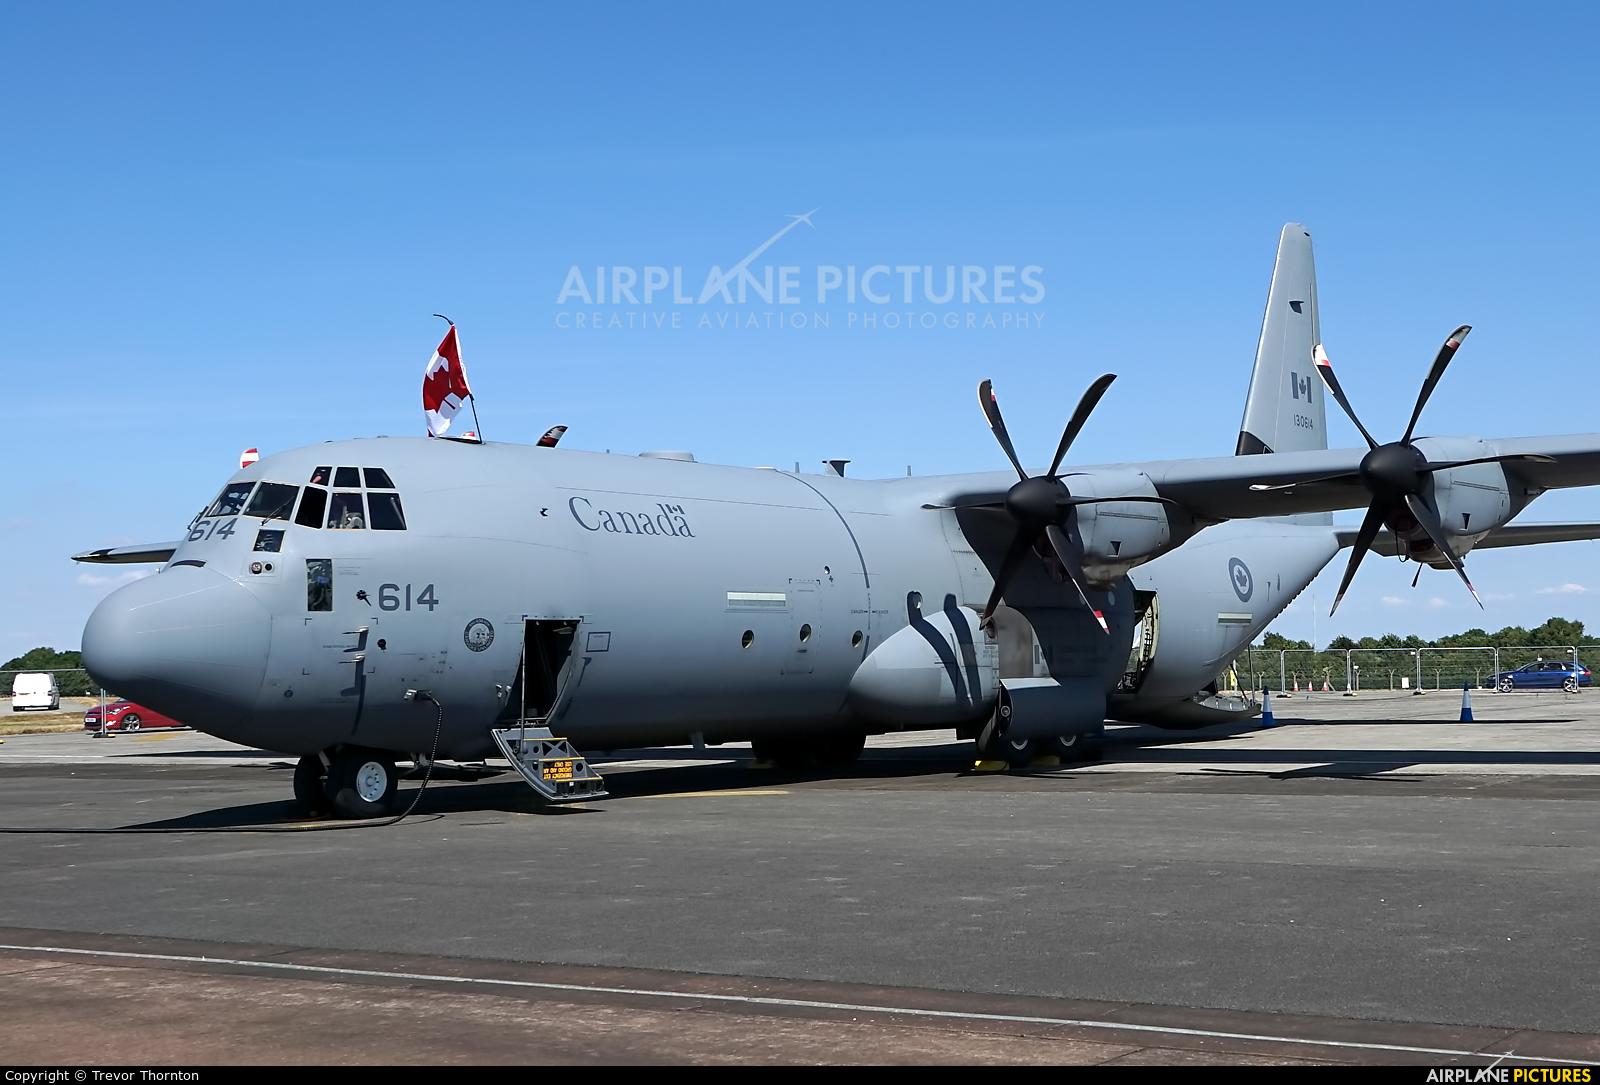 Canada - Air Force 130614 aircraft at Fairford